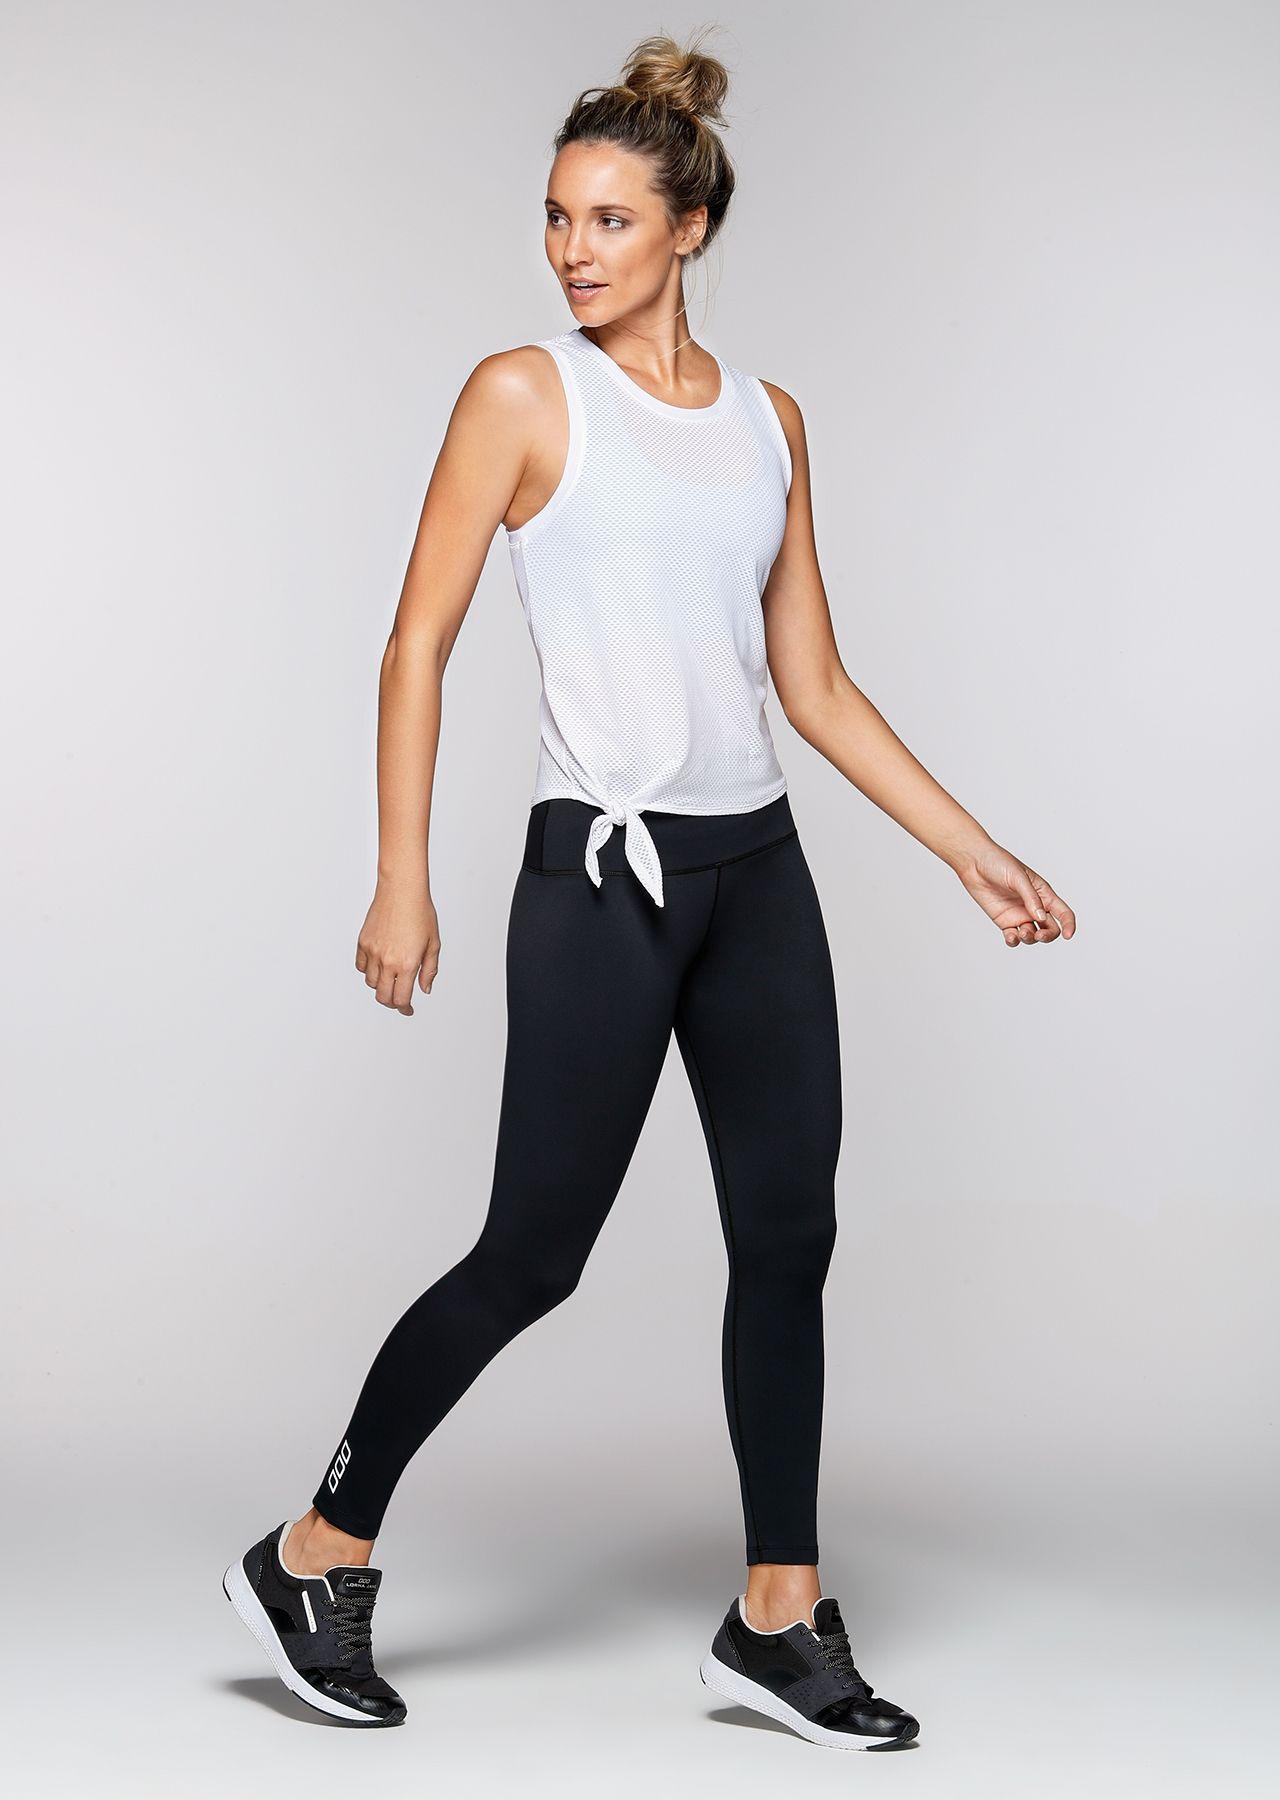 838cef86f0f8 Hey Baby Excel Tank FitnessApparelExpress.com ♡ Women s Workout Clothes  Yoga Tops Sports Bra Yoga